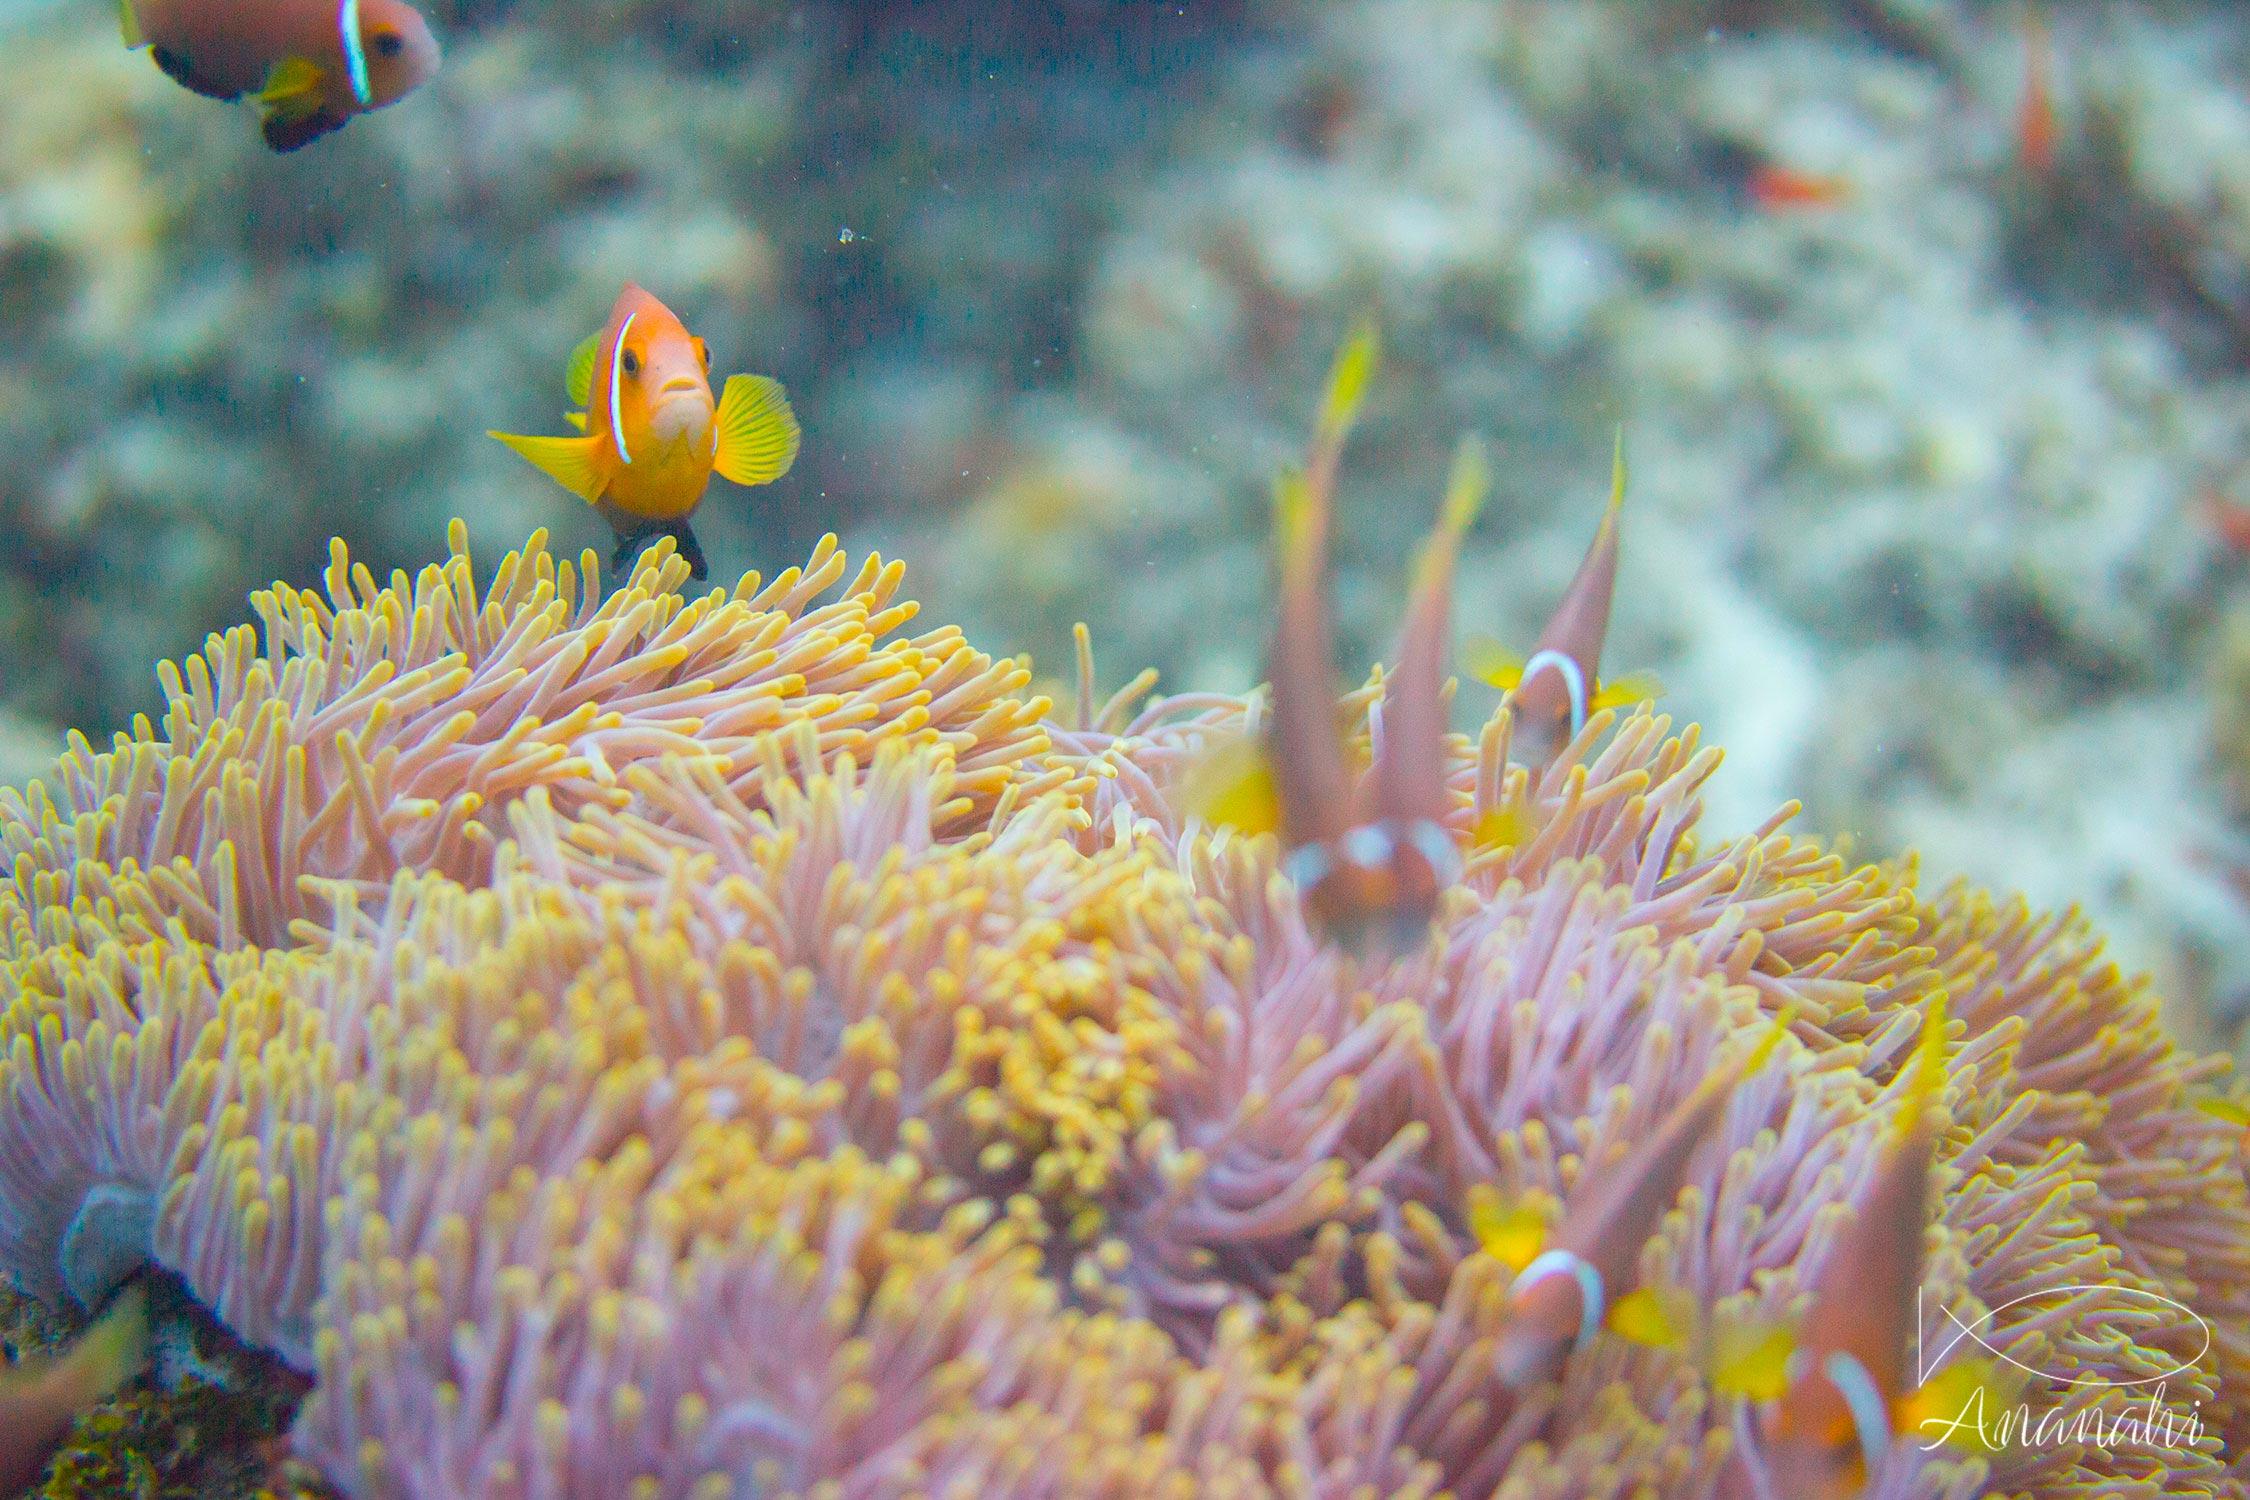 Blackfinned anemonefish of Maldives